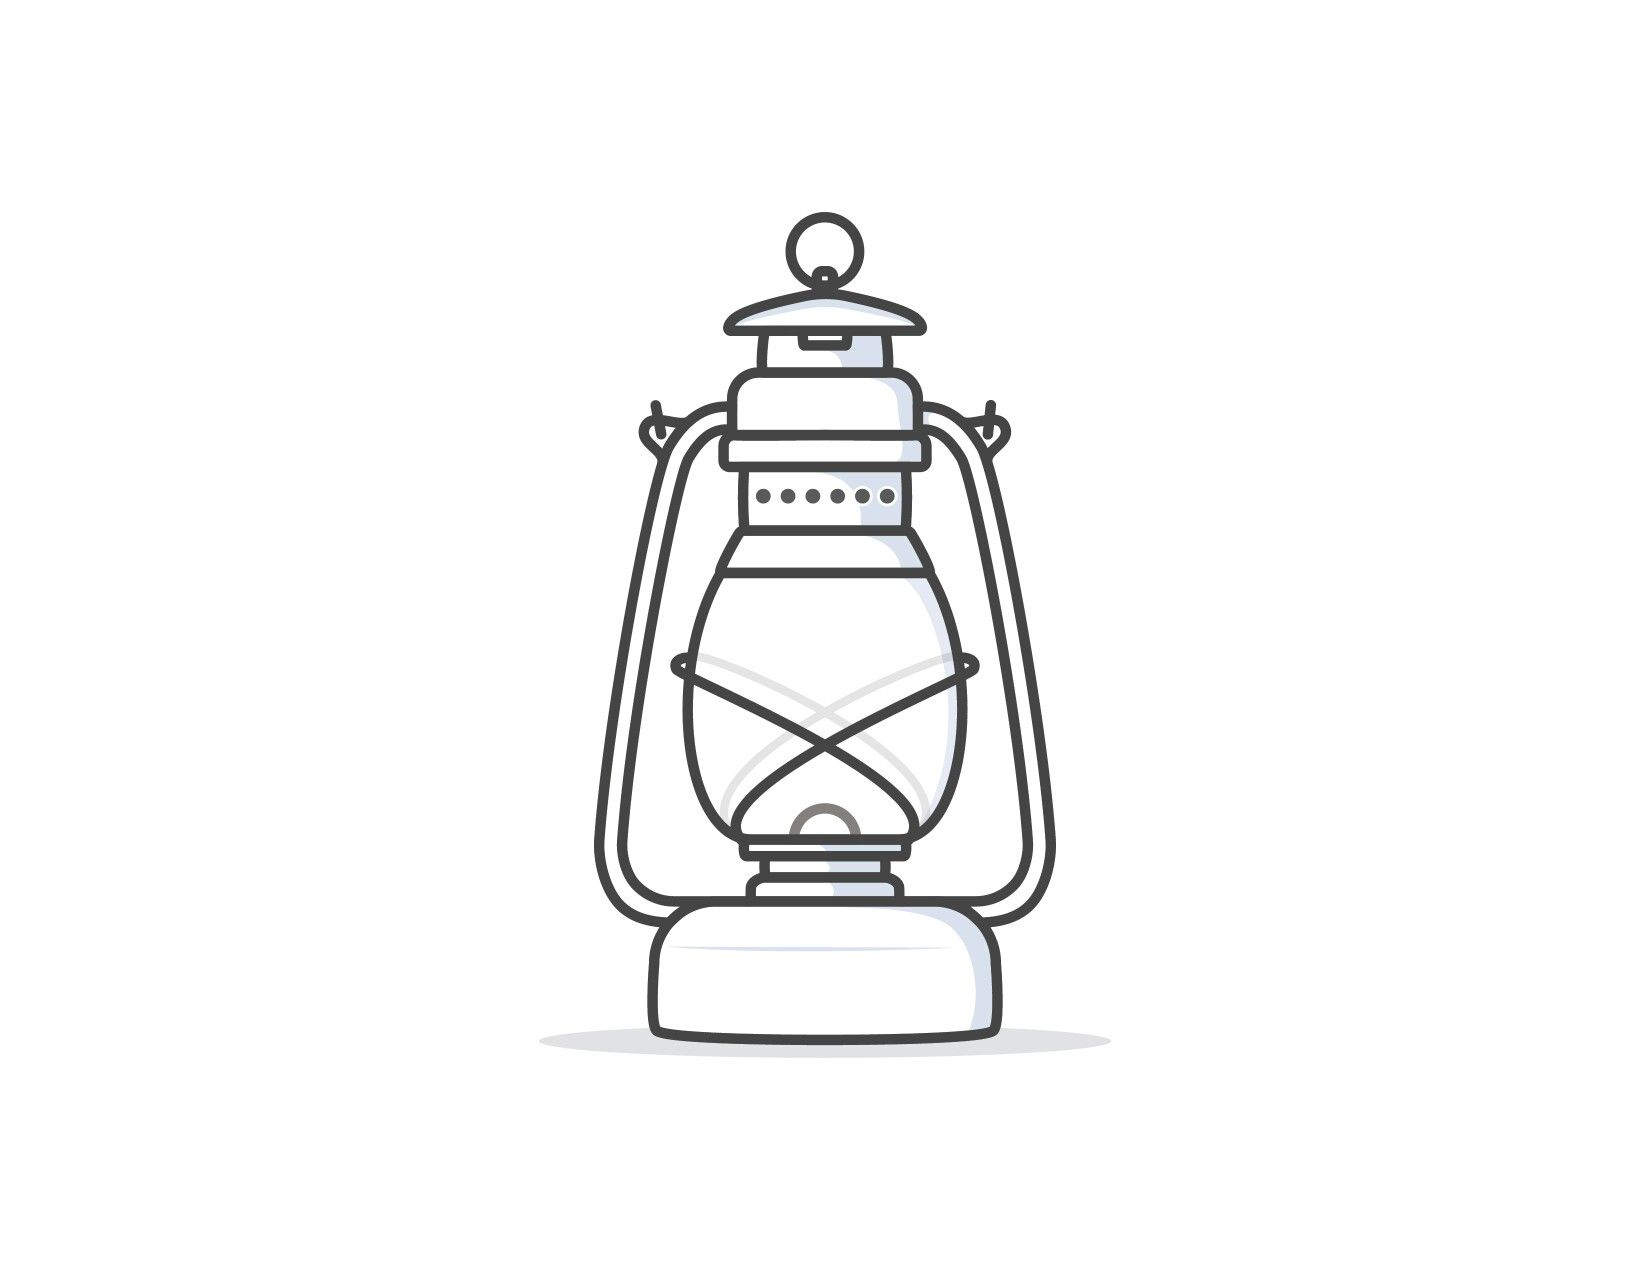 Lantern clipart paraffin lamp. Kerosene memories instagram niyibleedzink